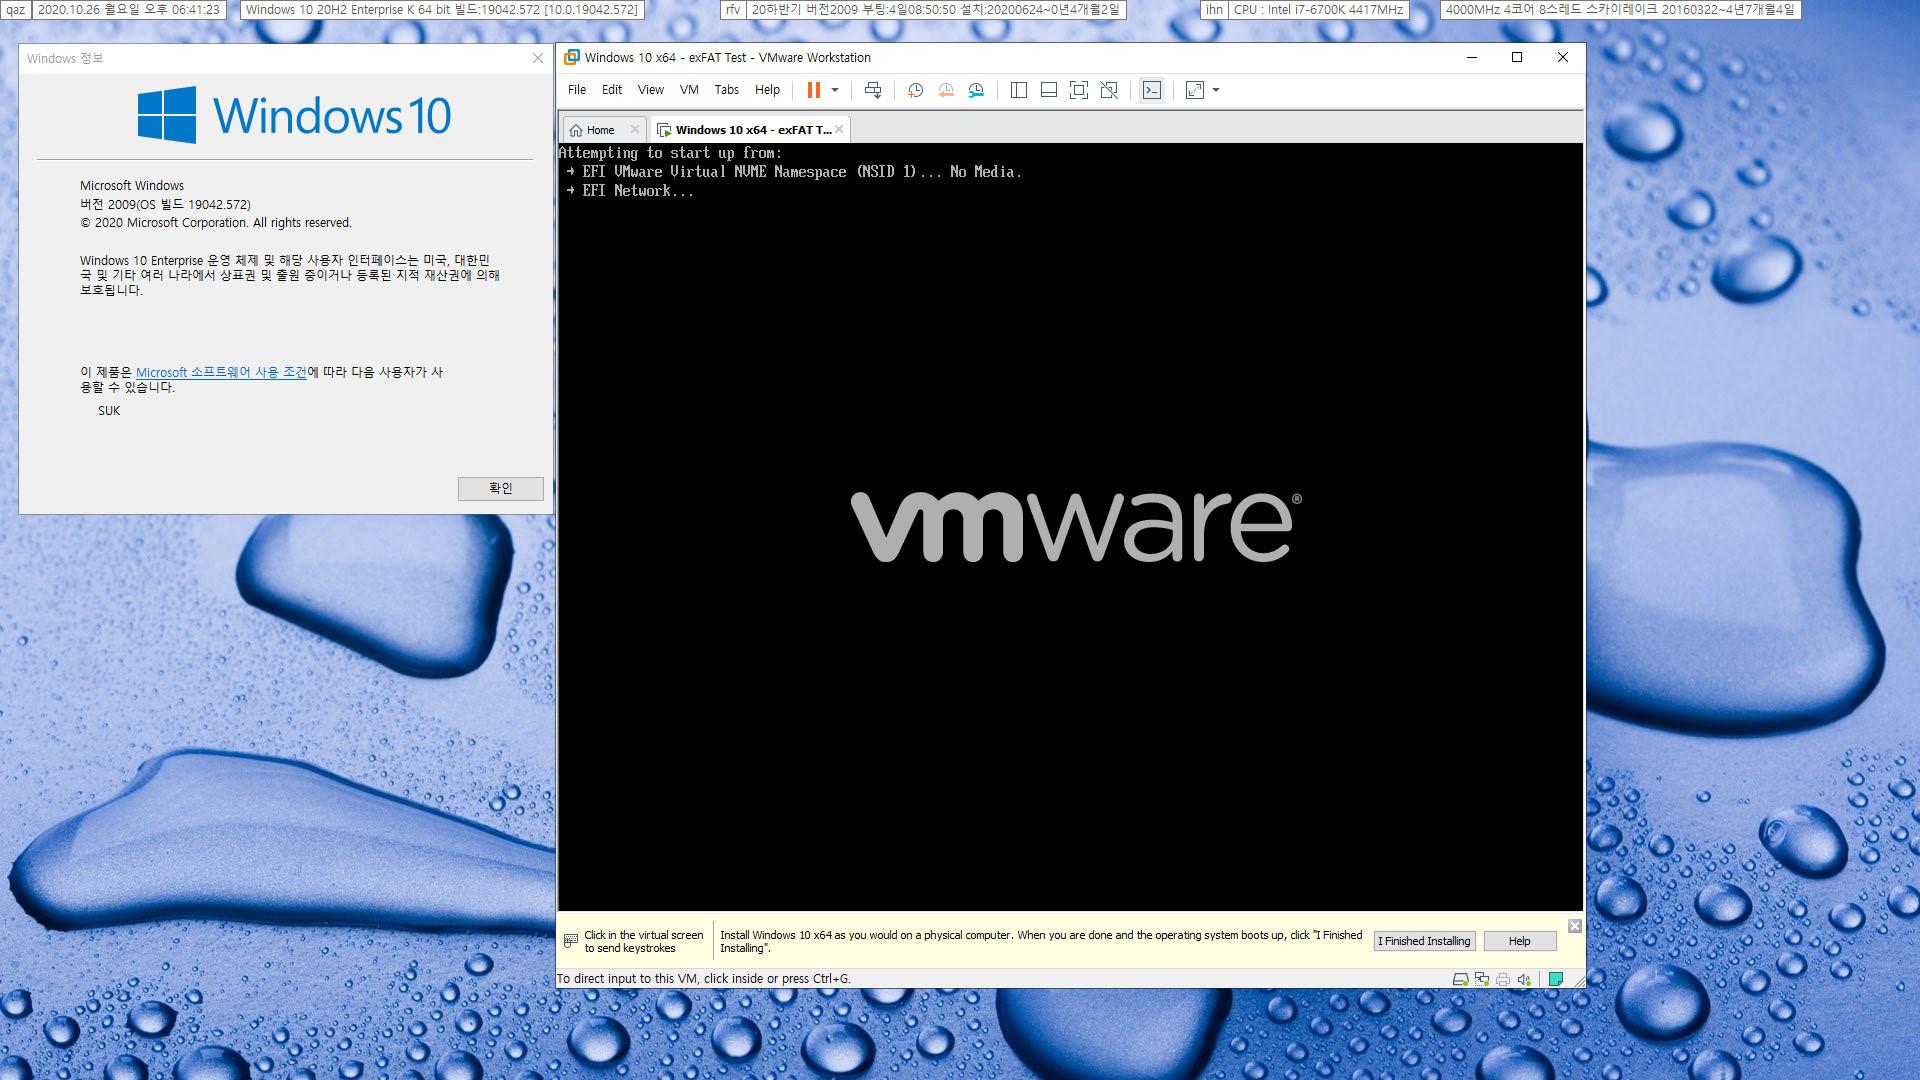 exFAT 포맷으로도 VHD 부팅이 Windows 10 버전 1903부터 된다고 하여 테스트 - 완전 생고생 했습니다 2020-10-26_184123.jpg